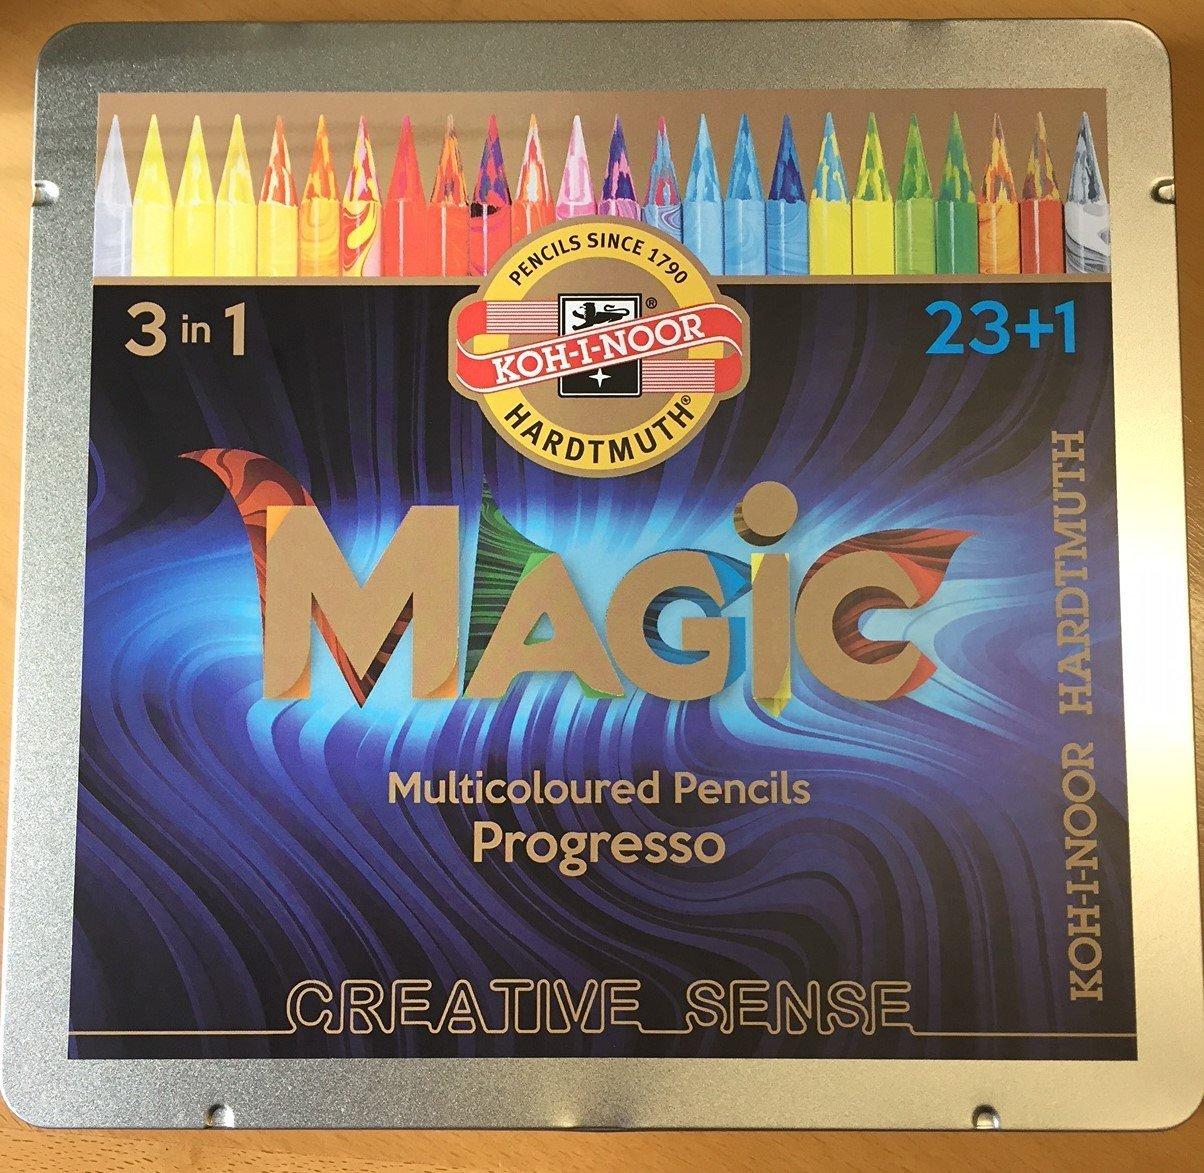 Koh-I-Noor Hardtmuth Progresso, Set of Woodless Color Pencils - MAGIC, Multi-coloured Pencils in Metal Box, 23+1